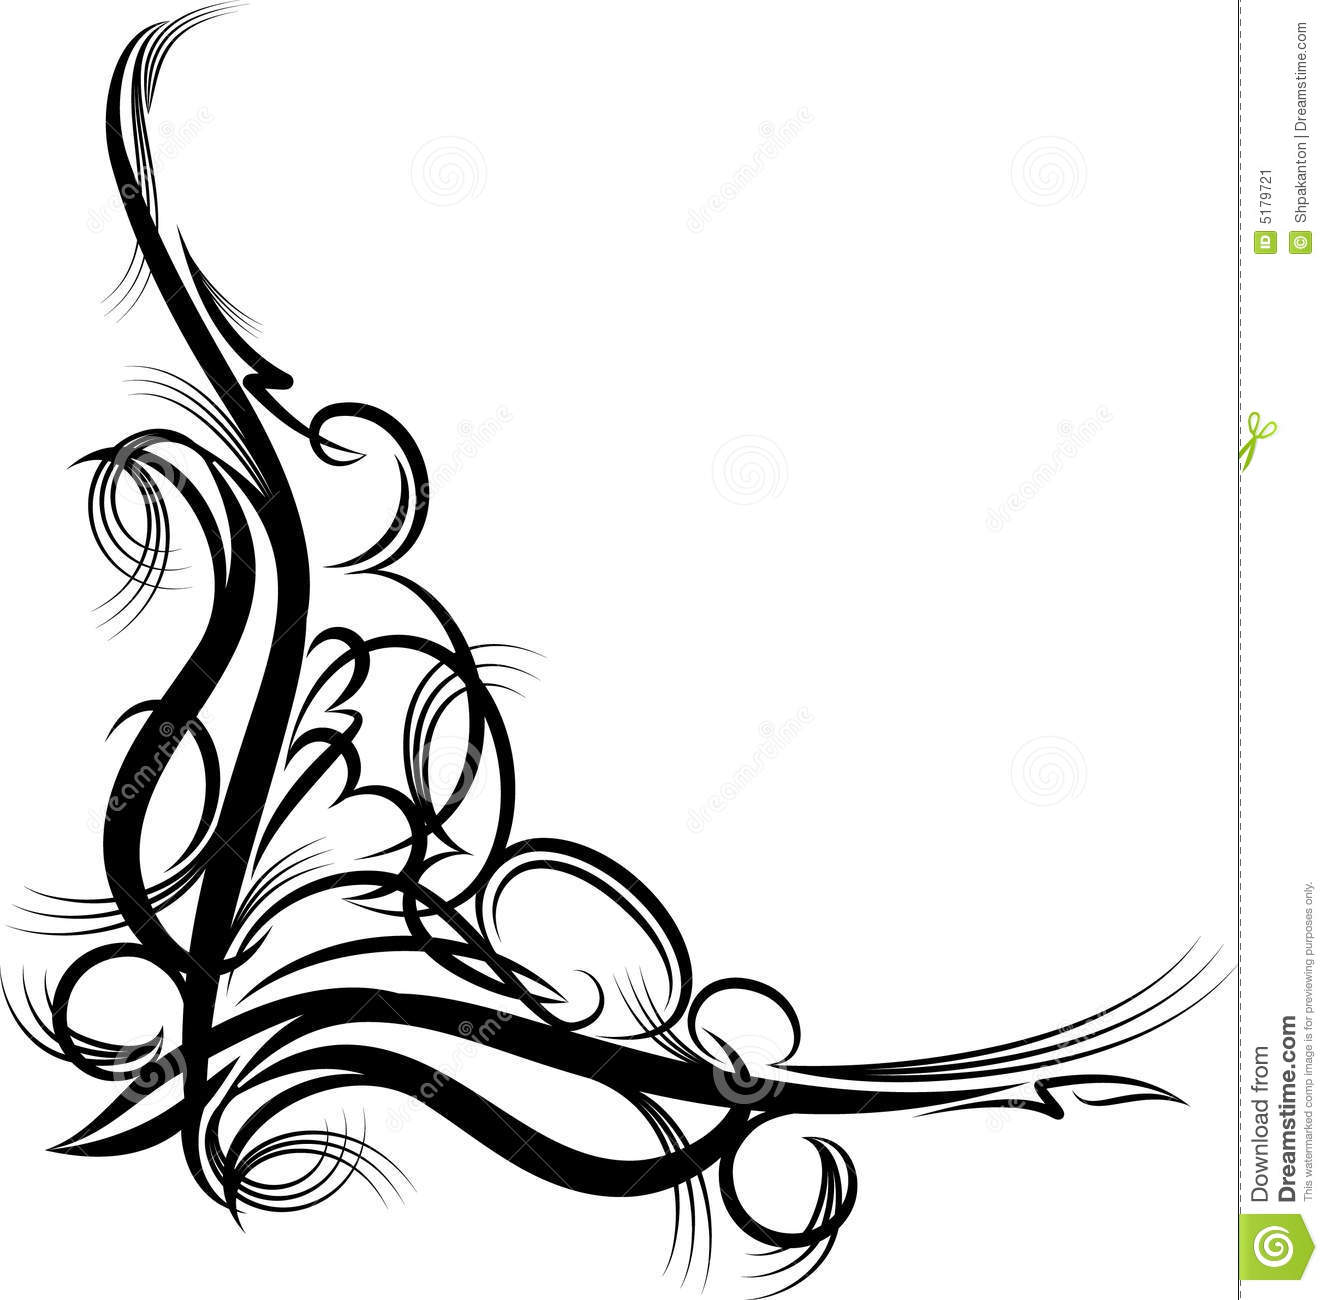 16 Corner Designs Vector Images - Ornament Corner Vector ...  Fancy